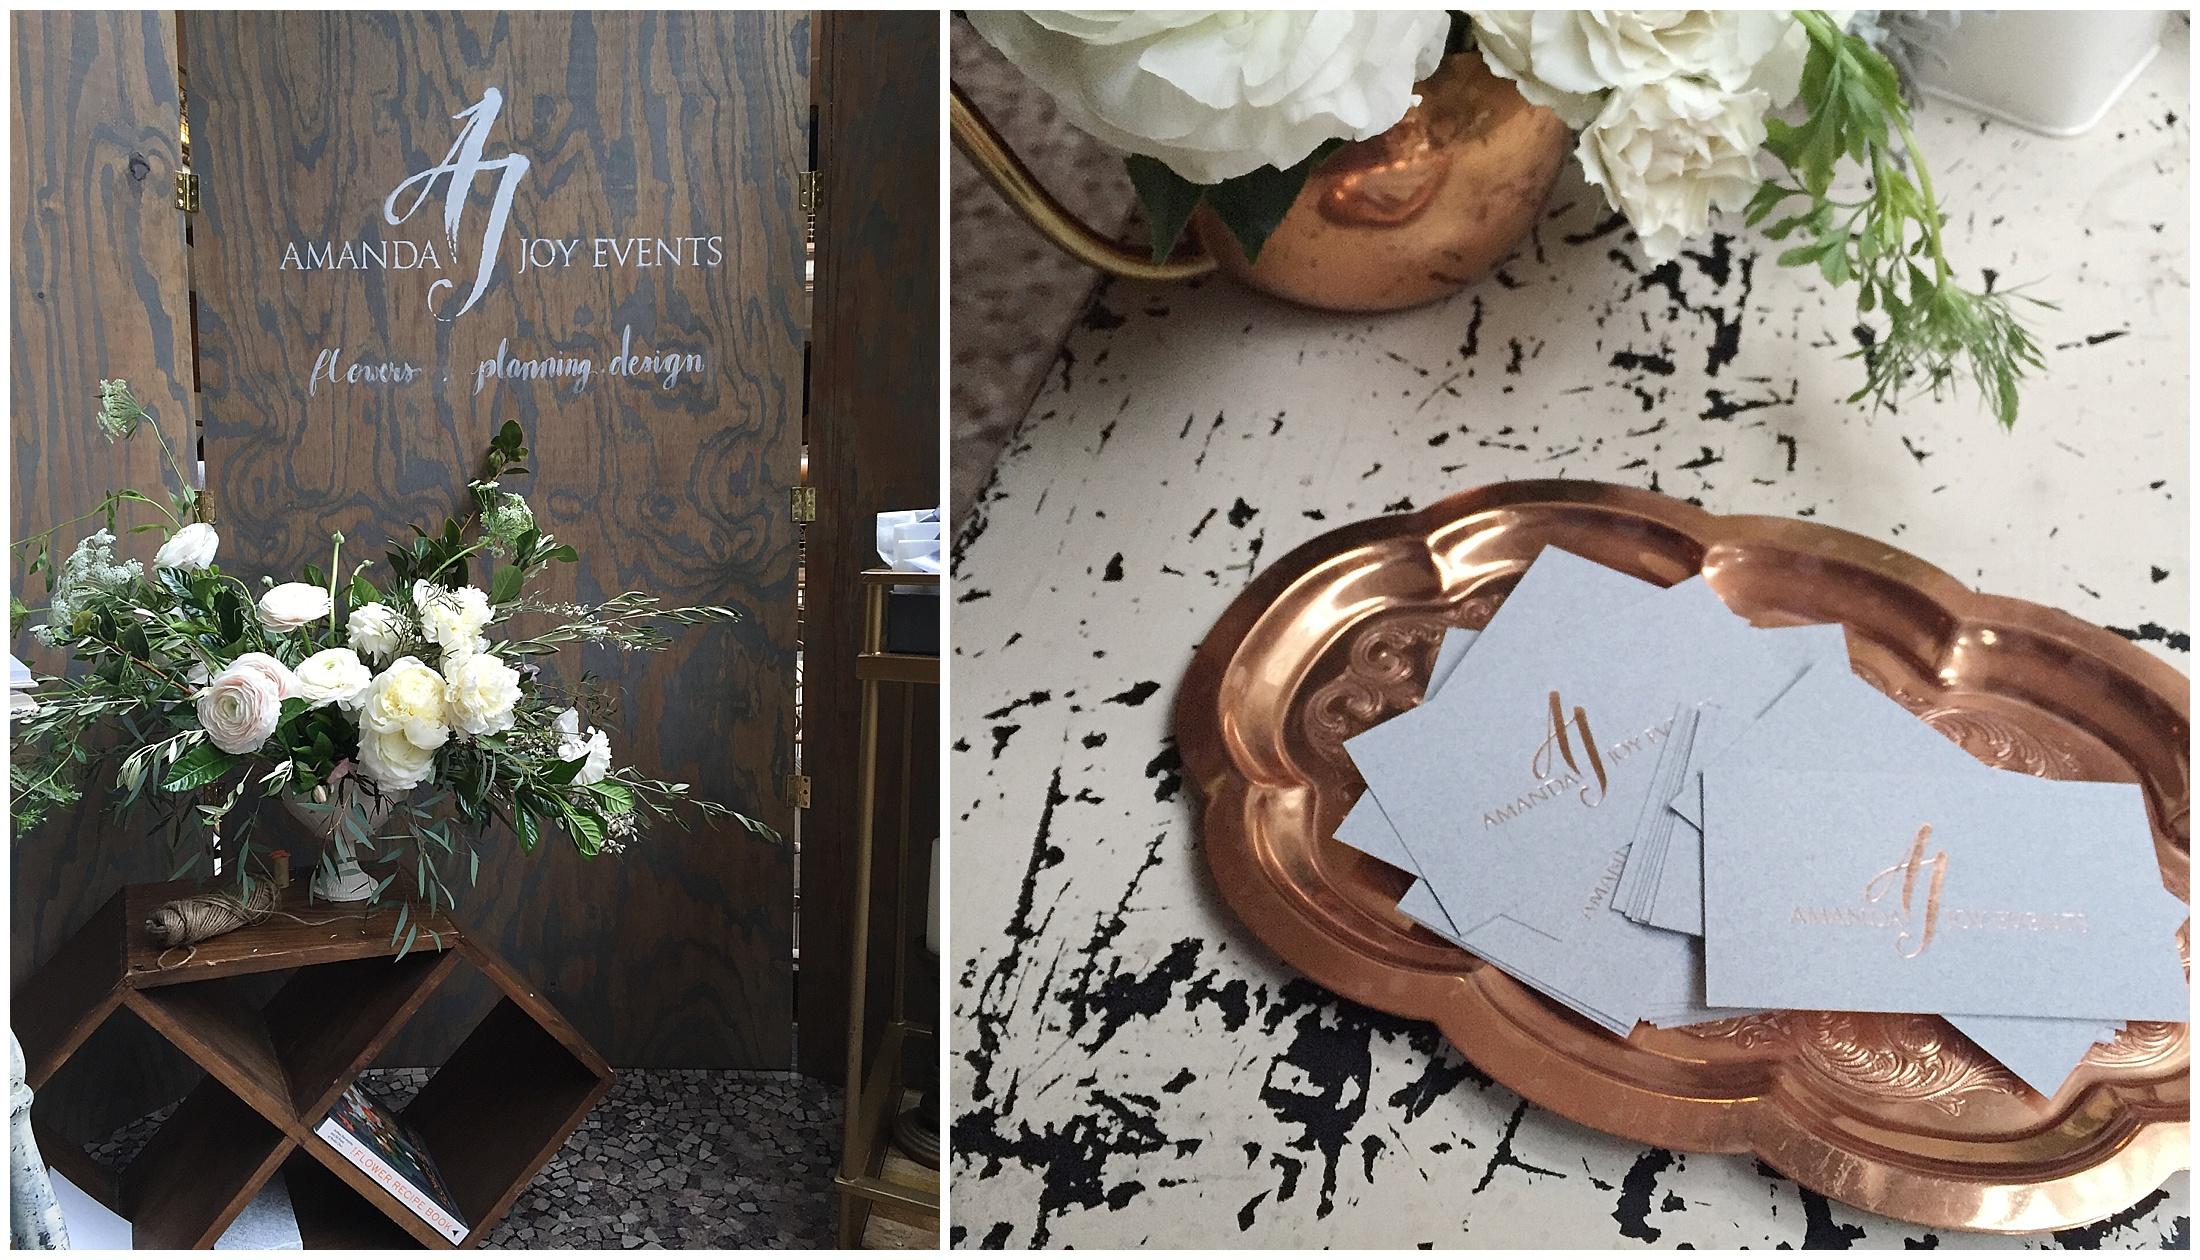 boutique-bridal-bazaar-2016-amanda-joy-events